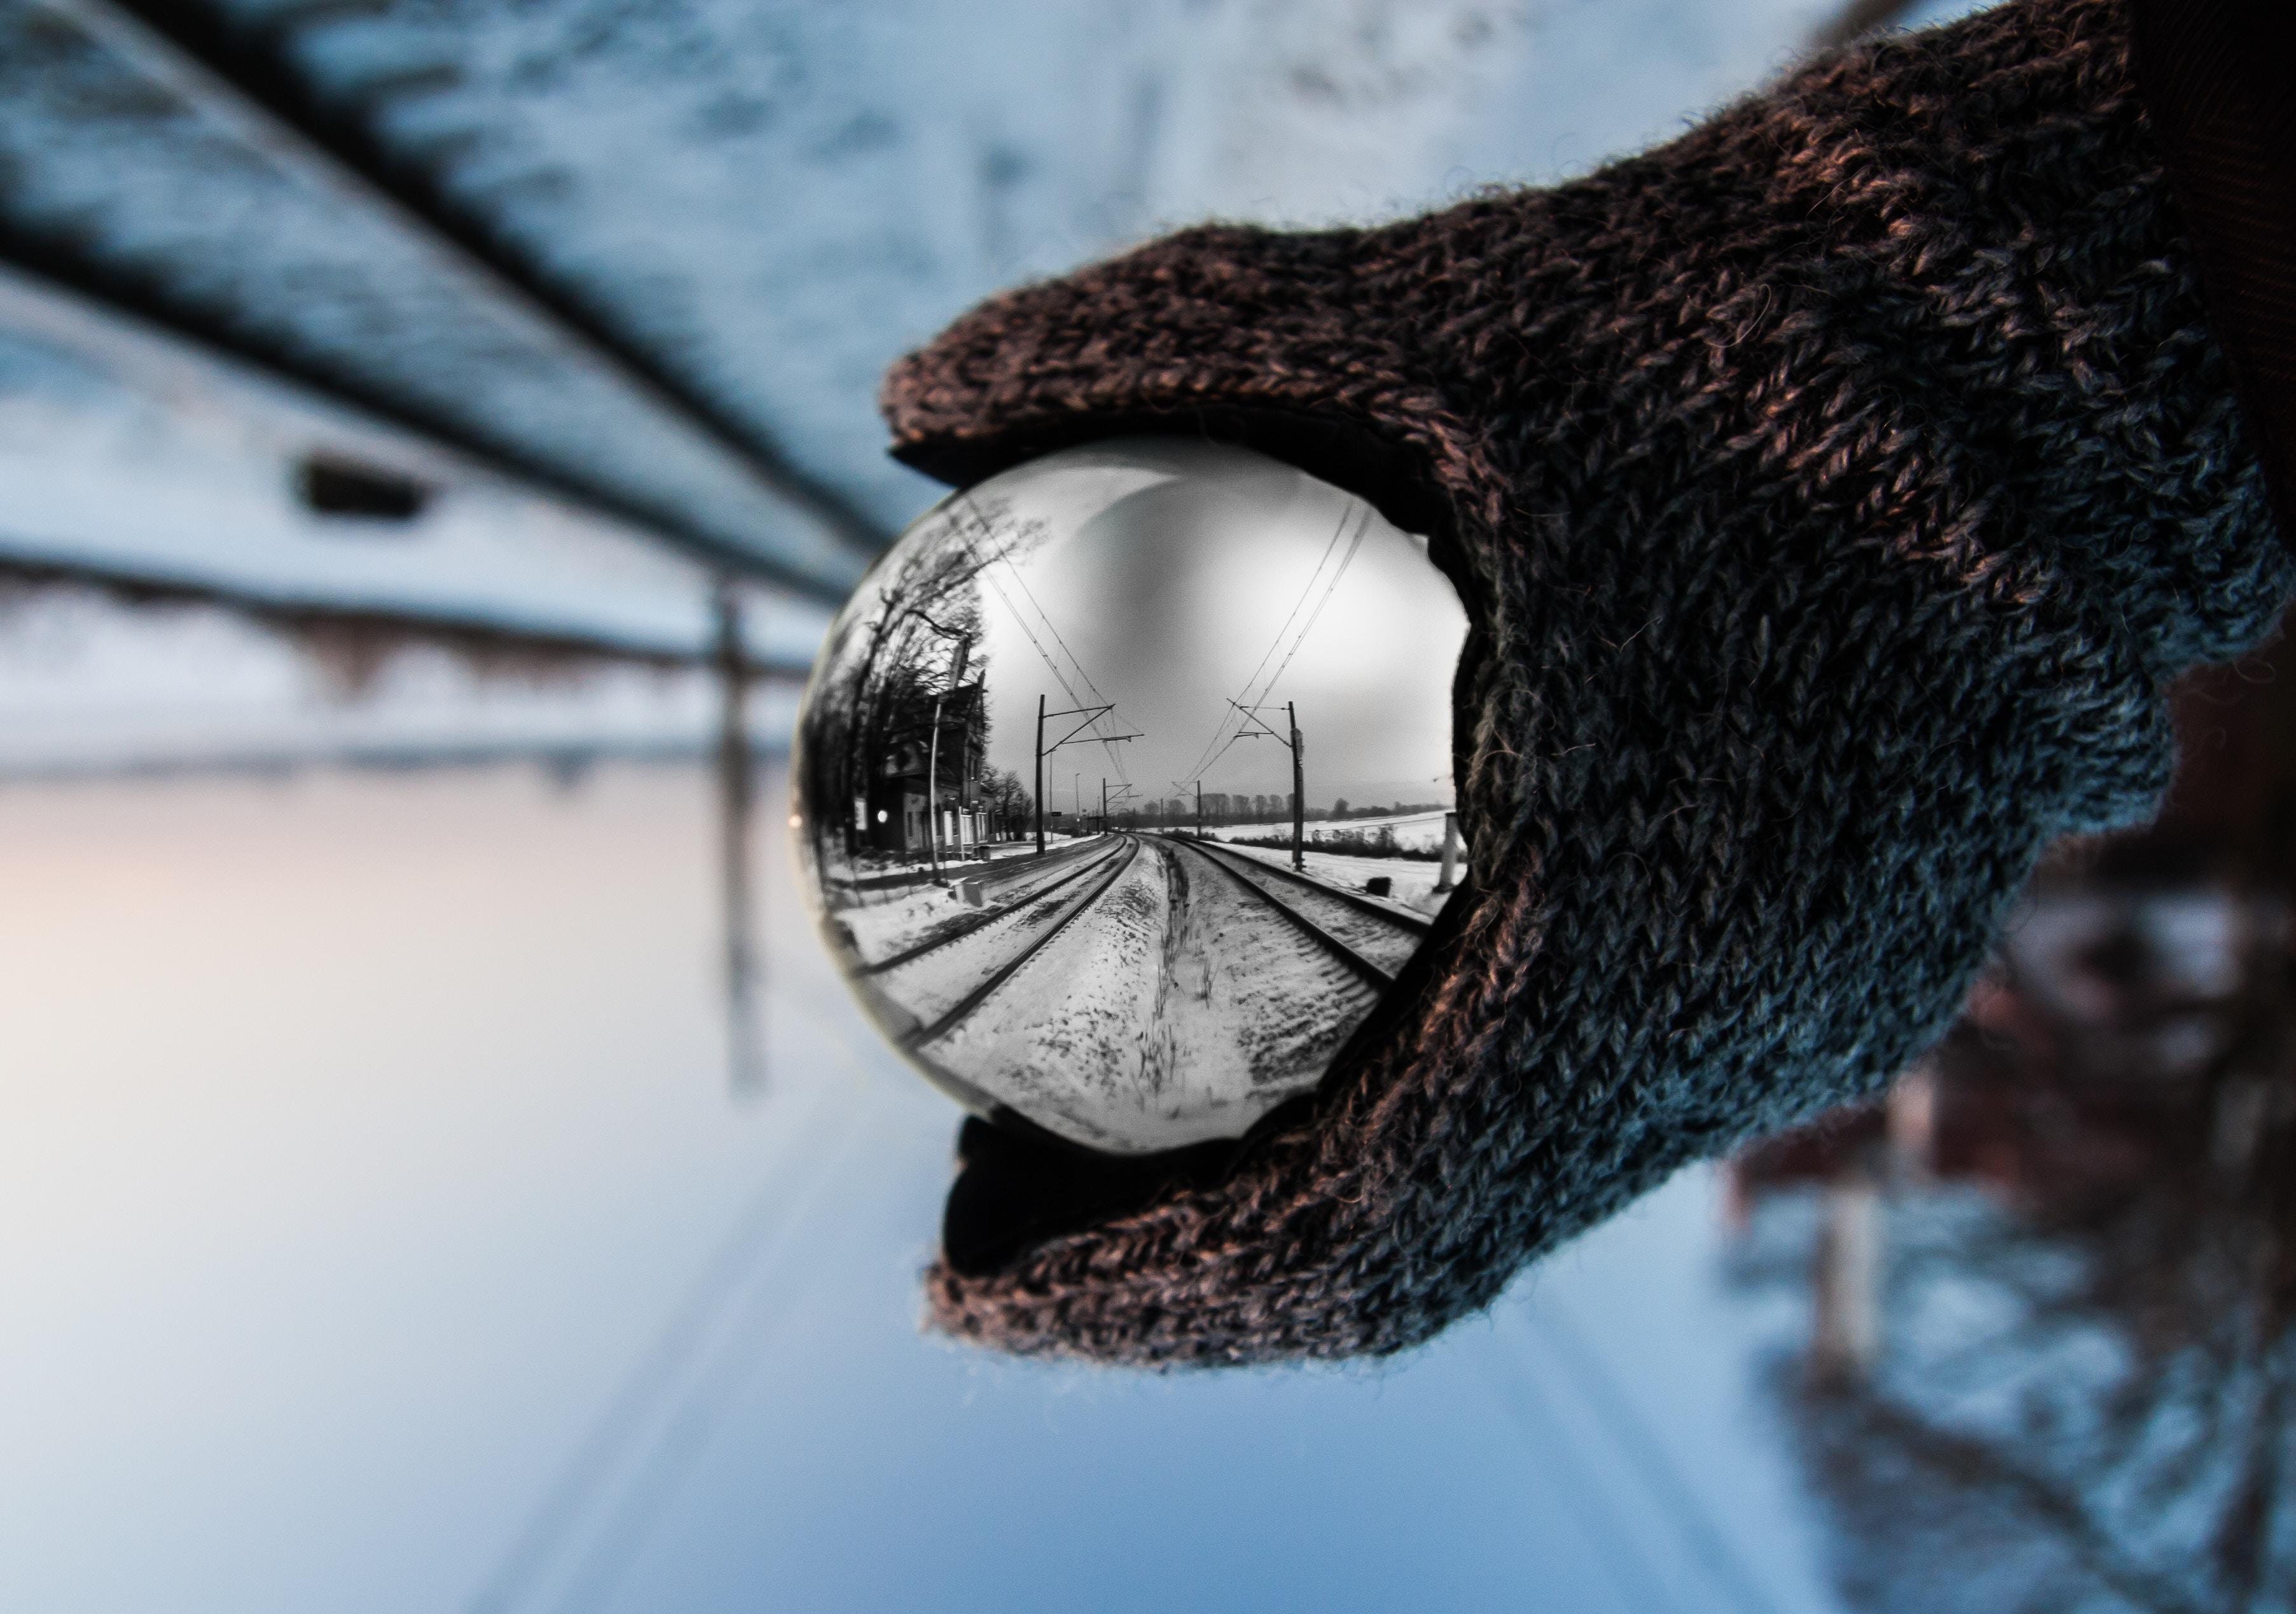 avenue.de - Wahrnehmungsfilter